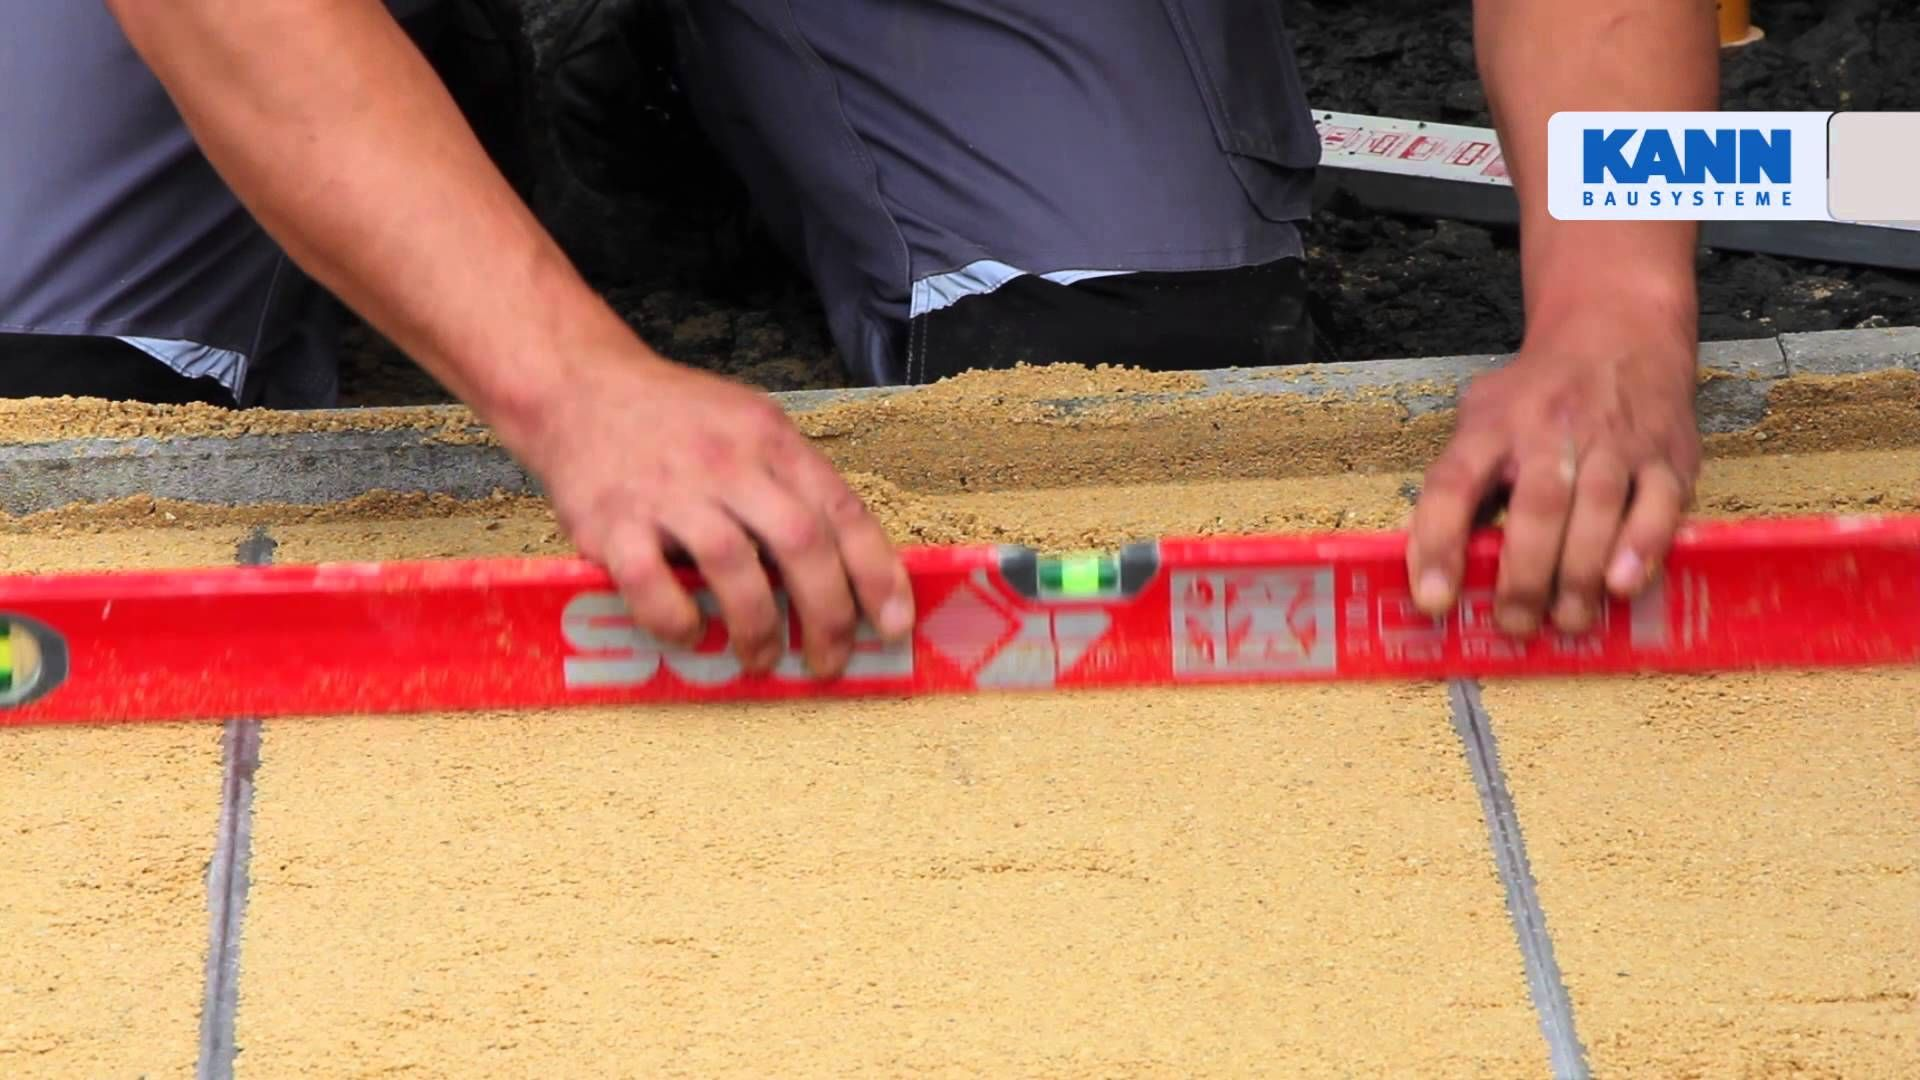 anleitung: pflastersteine verlegen wie die profis   handyman - how